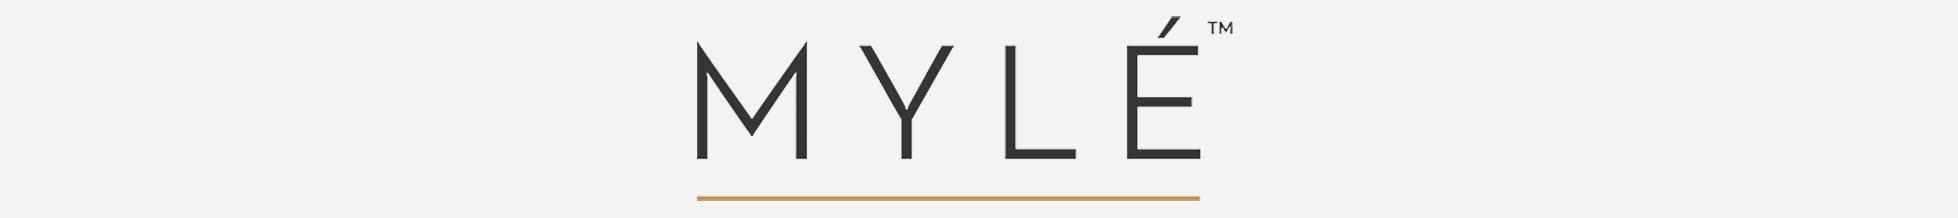 myle-category.jpg